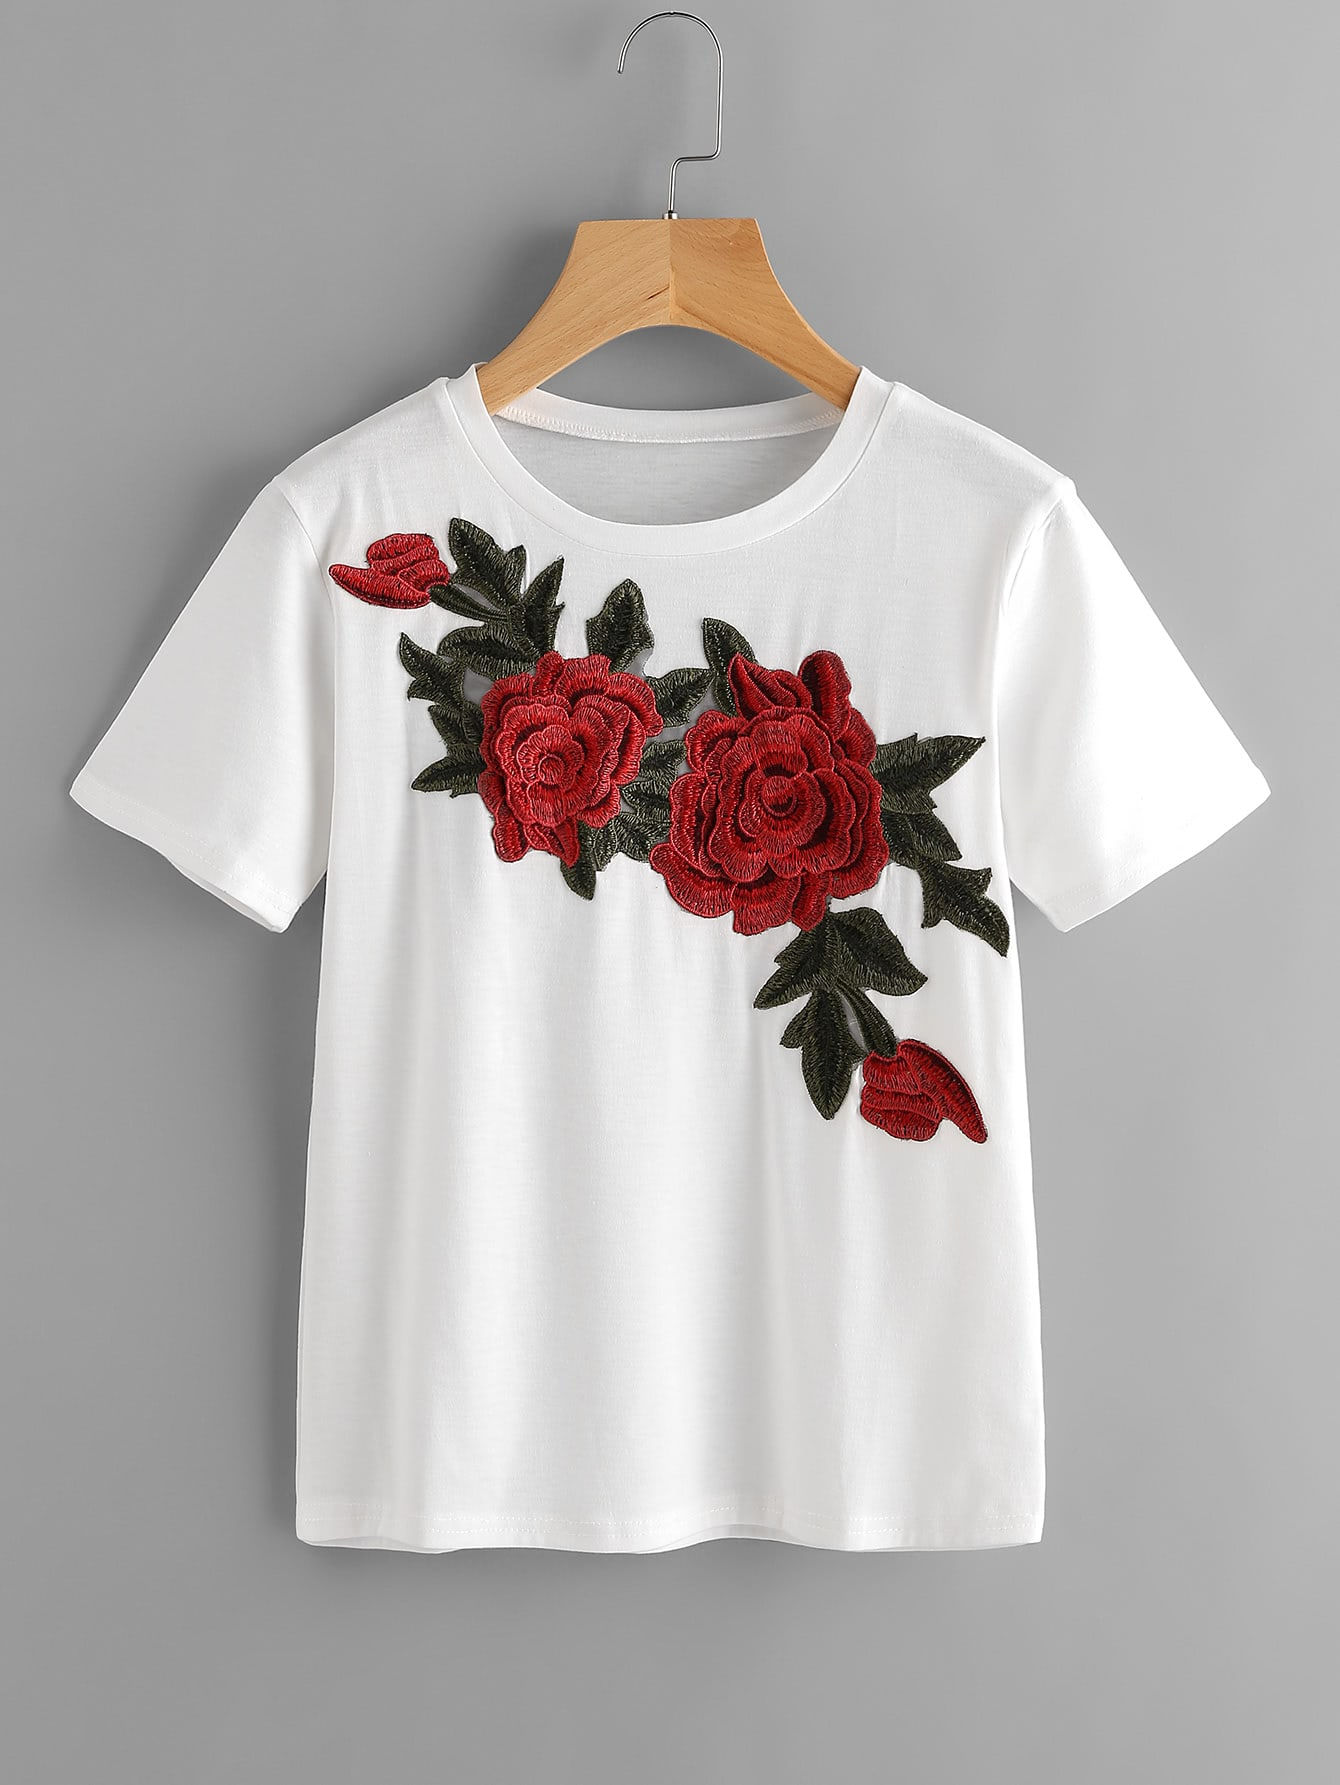 tee shirt brod des roses avec des appliques french romwe. Black Bedroom Furniture Sets. Home Design Ideas